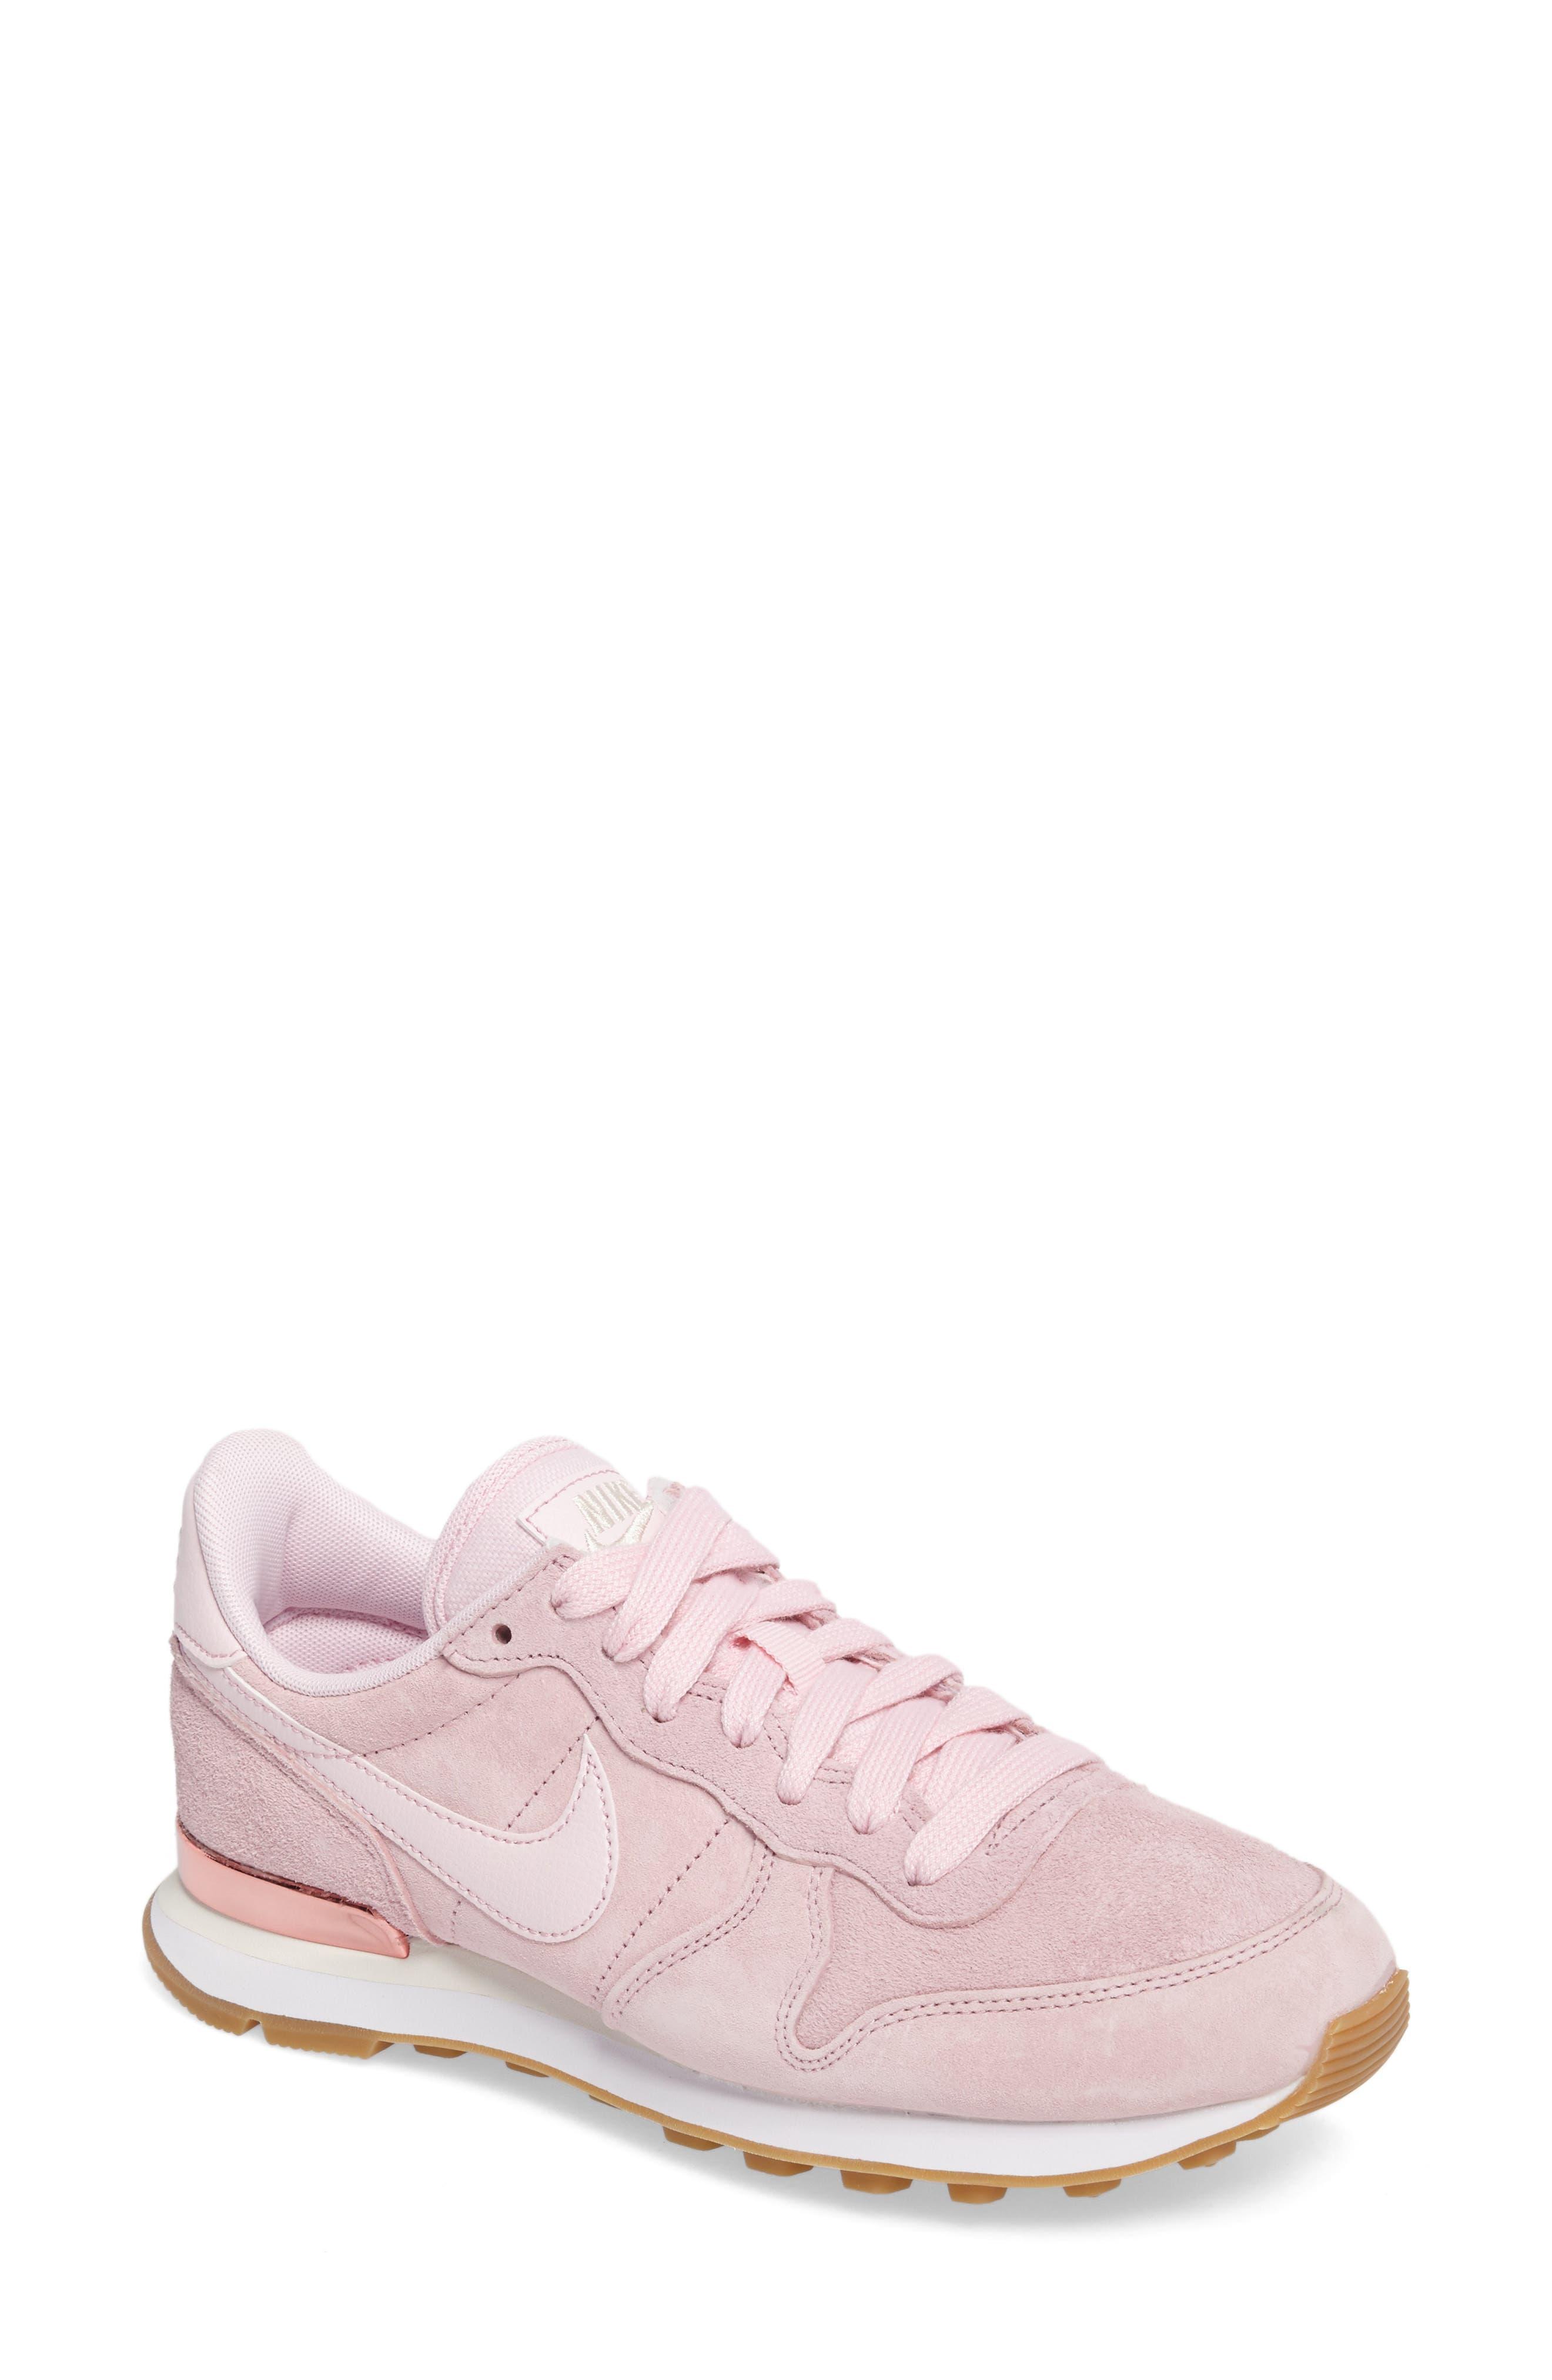 Internationalist SD Sneaker,                         Main,                         color, Prism Pink/ Prism Pink